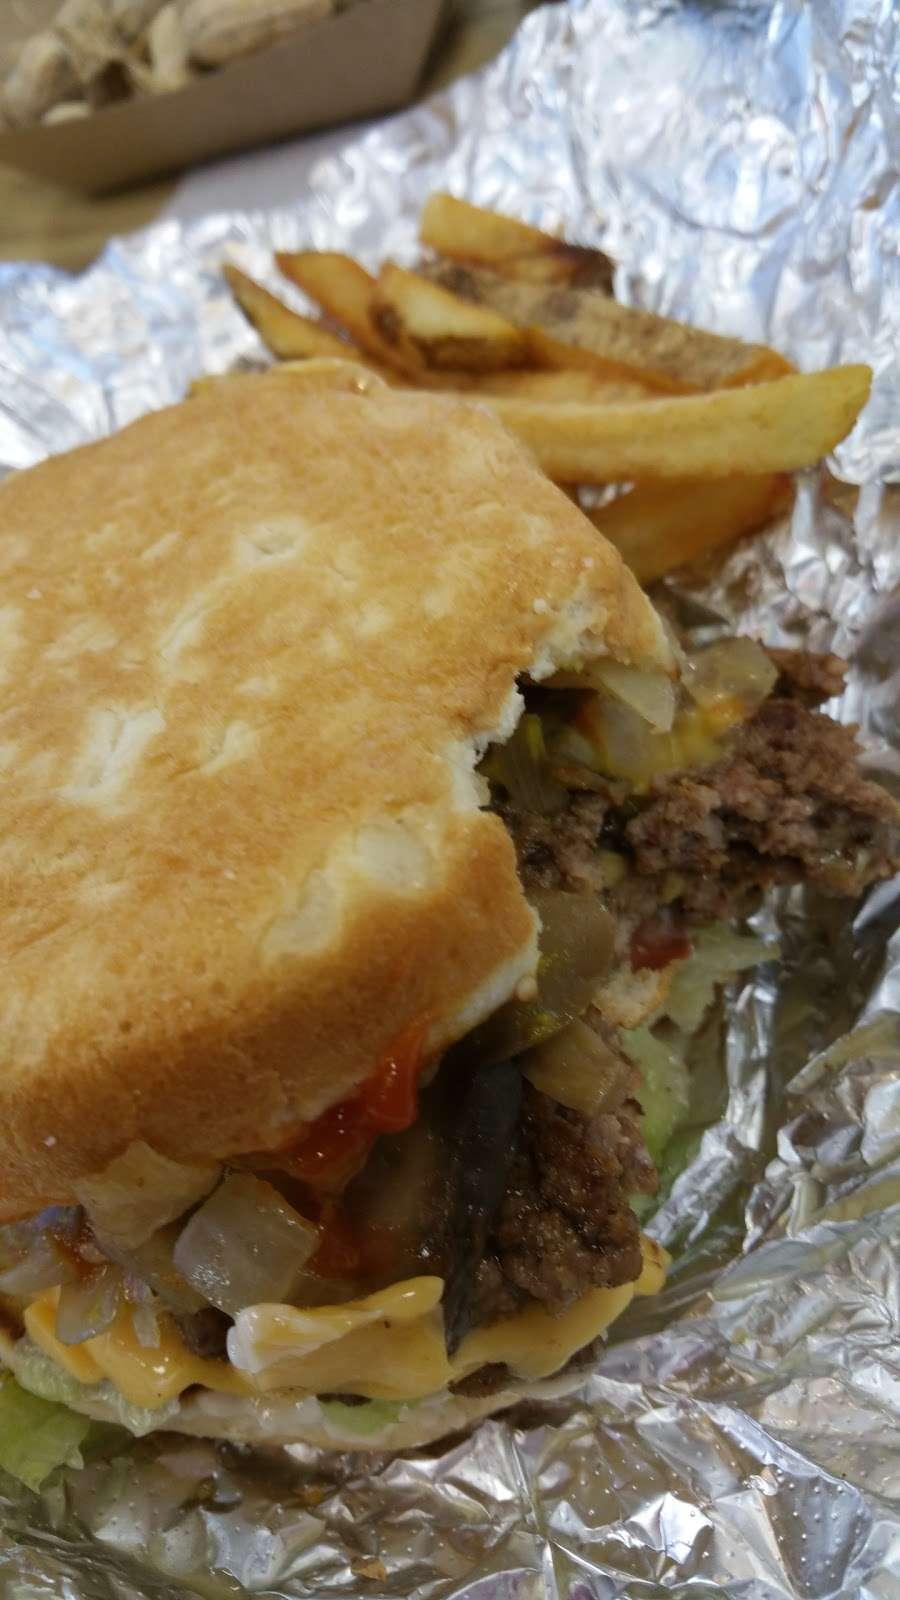 Five Guys - meal takeaway  | Photo 4 of 10 | Address: 361 Charles Way, Stroudsburg, PA 18360, USA | Phone: (570) 421-9804